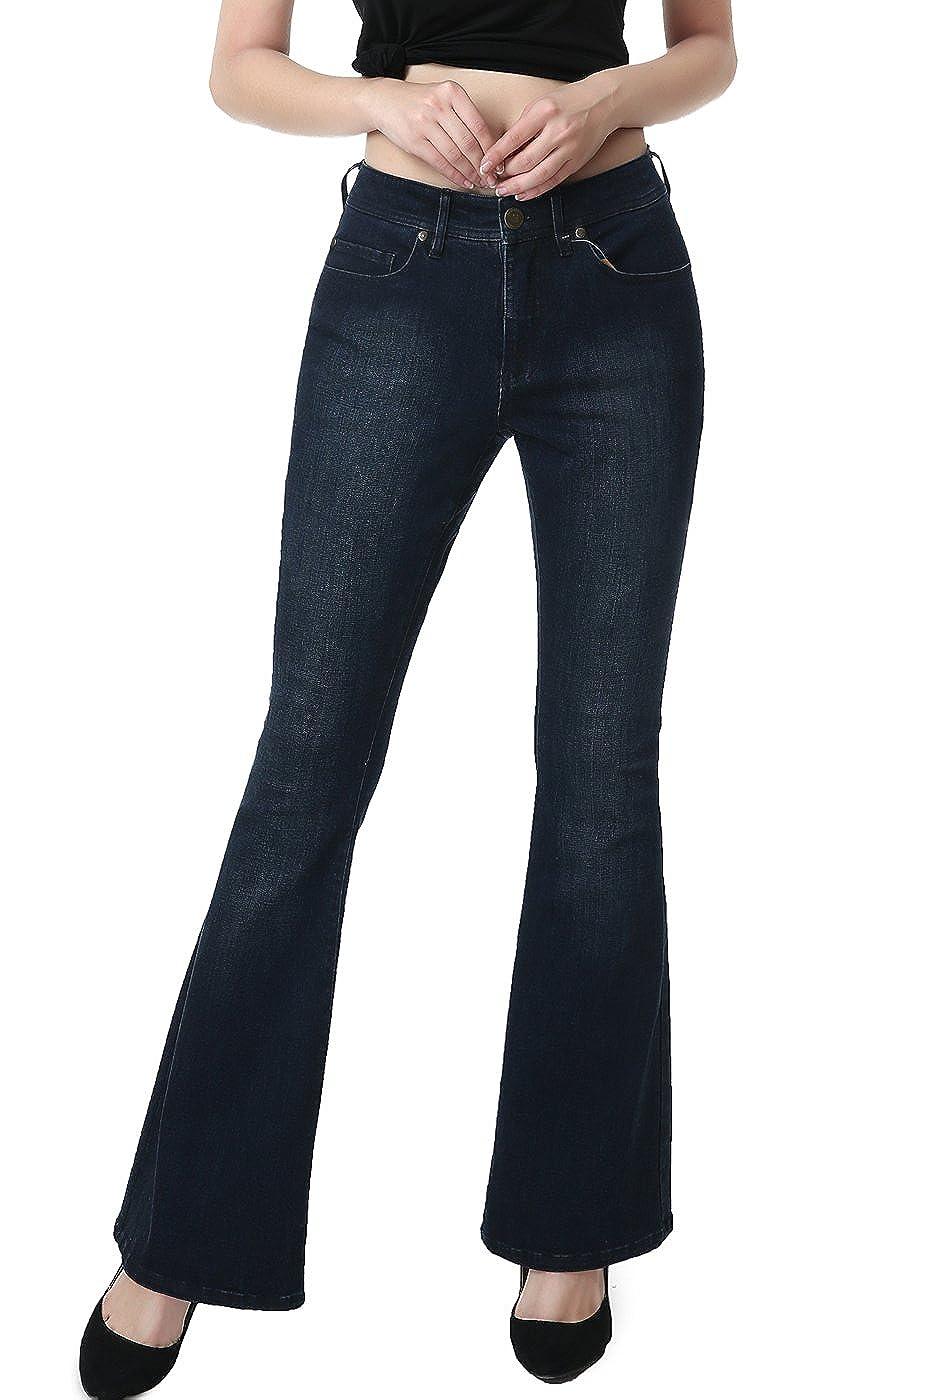 phistic Womens Ultra Stretch Dark Indigo Flare Jeans